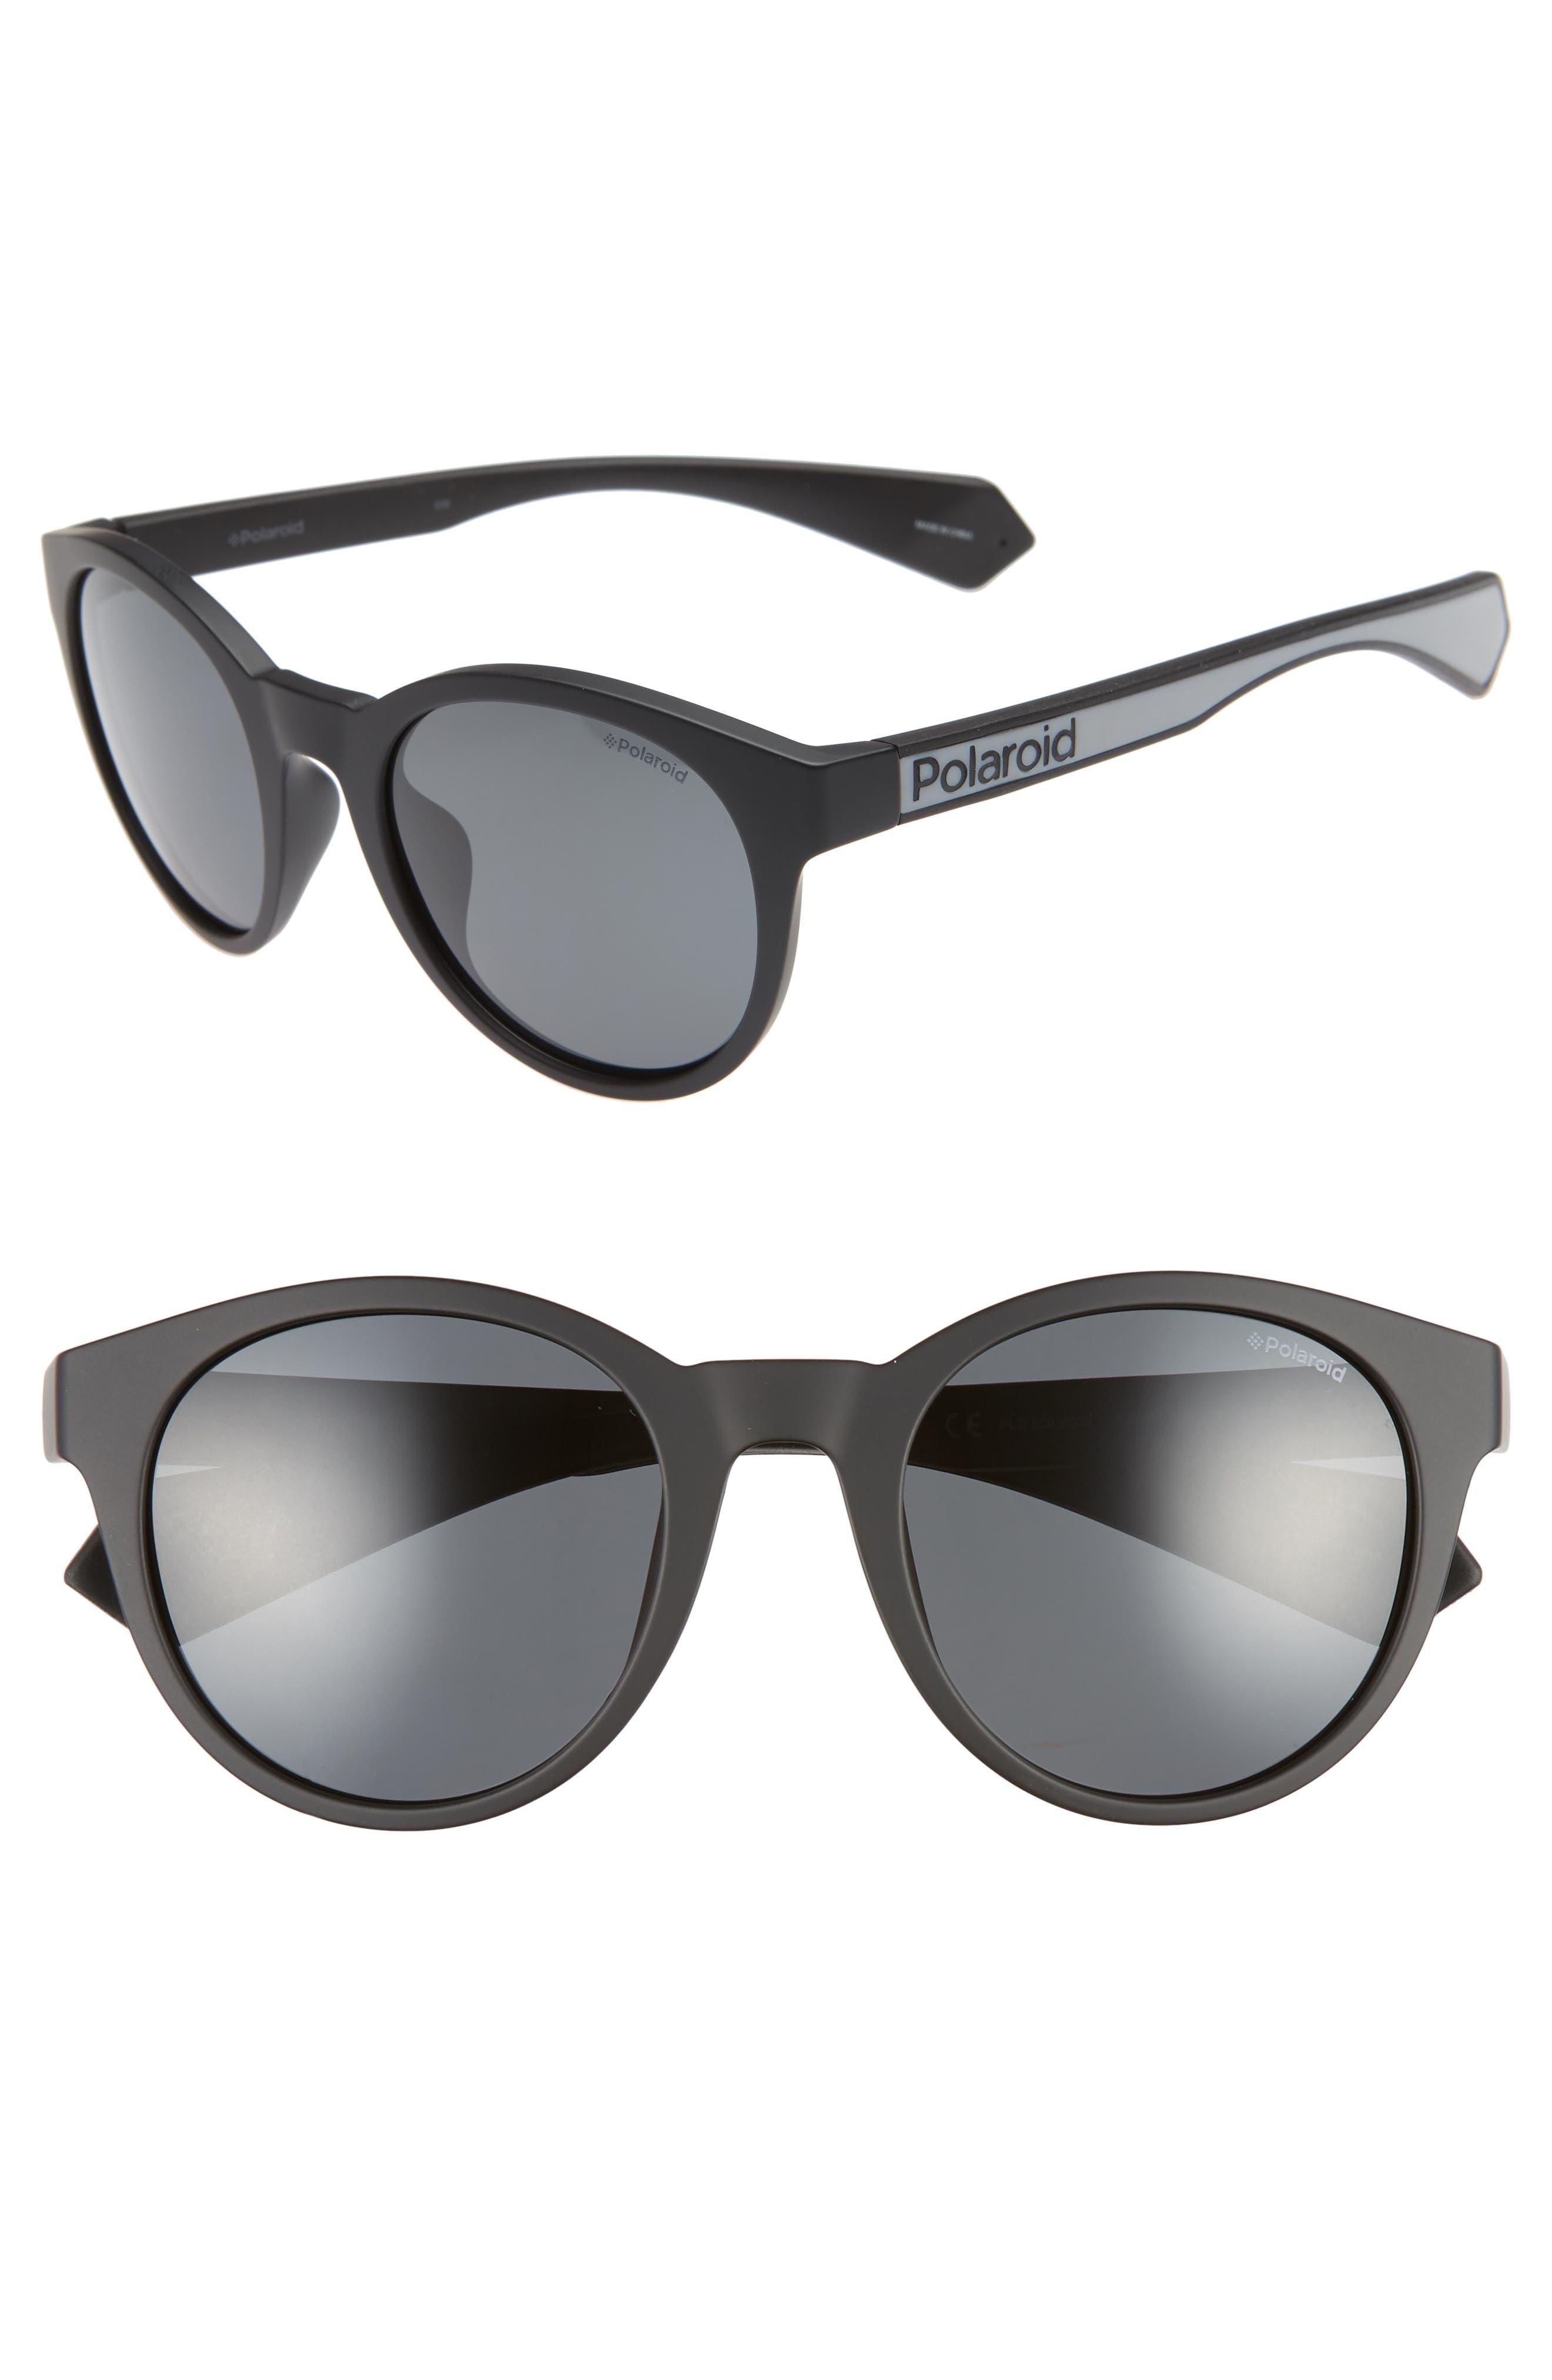 Polaroid 52Mm Polarized Round Sunglasses - Matte Black